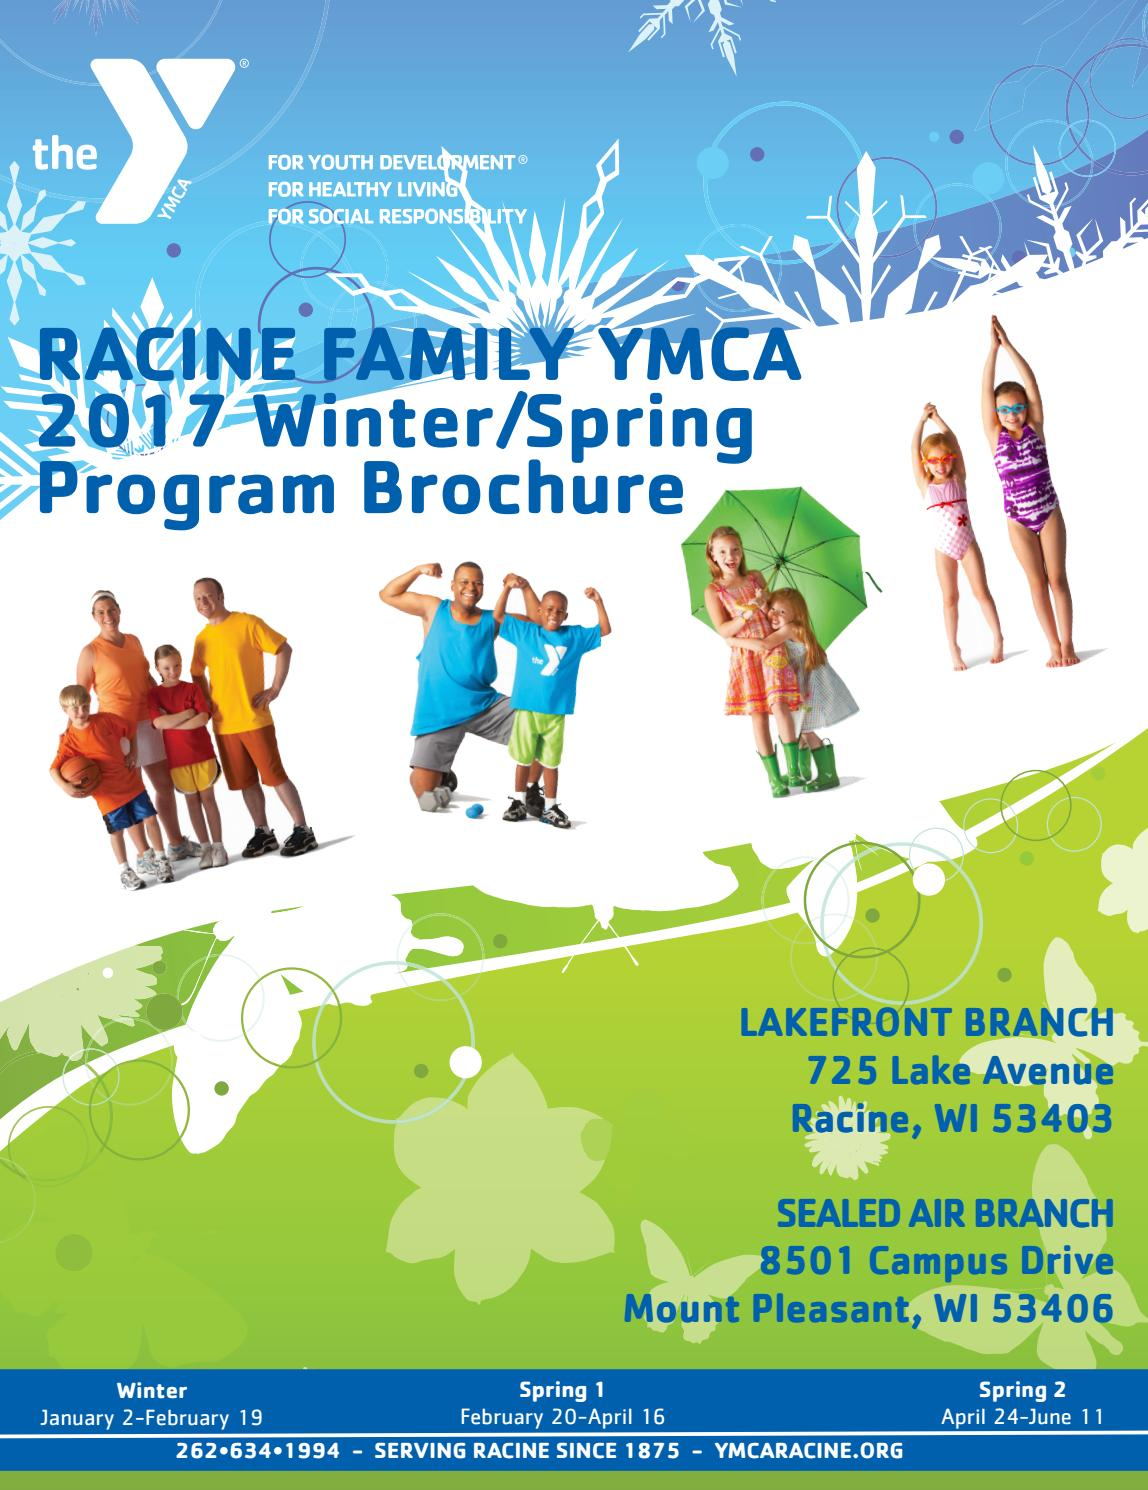 ymcaracine org winter spring brochure